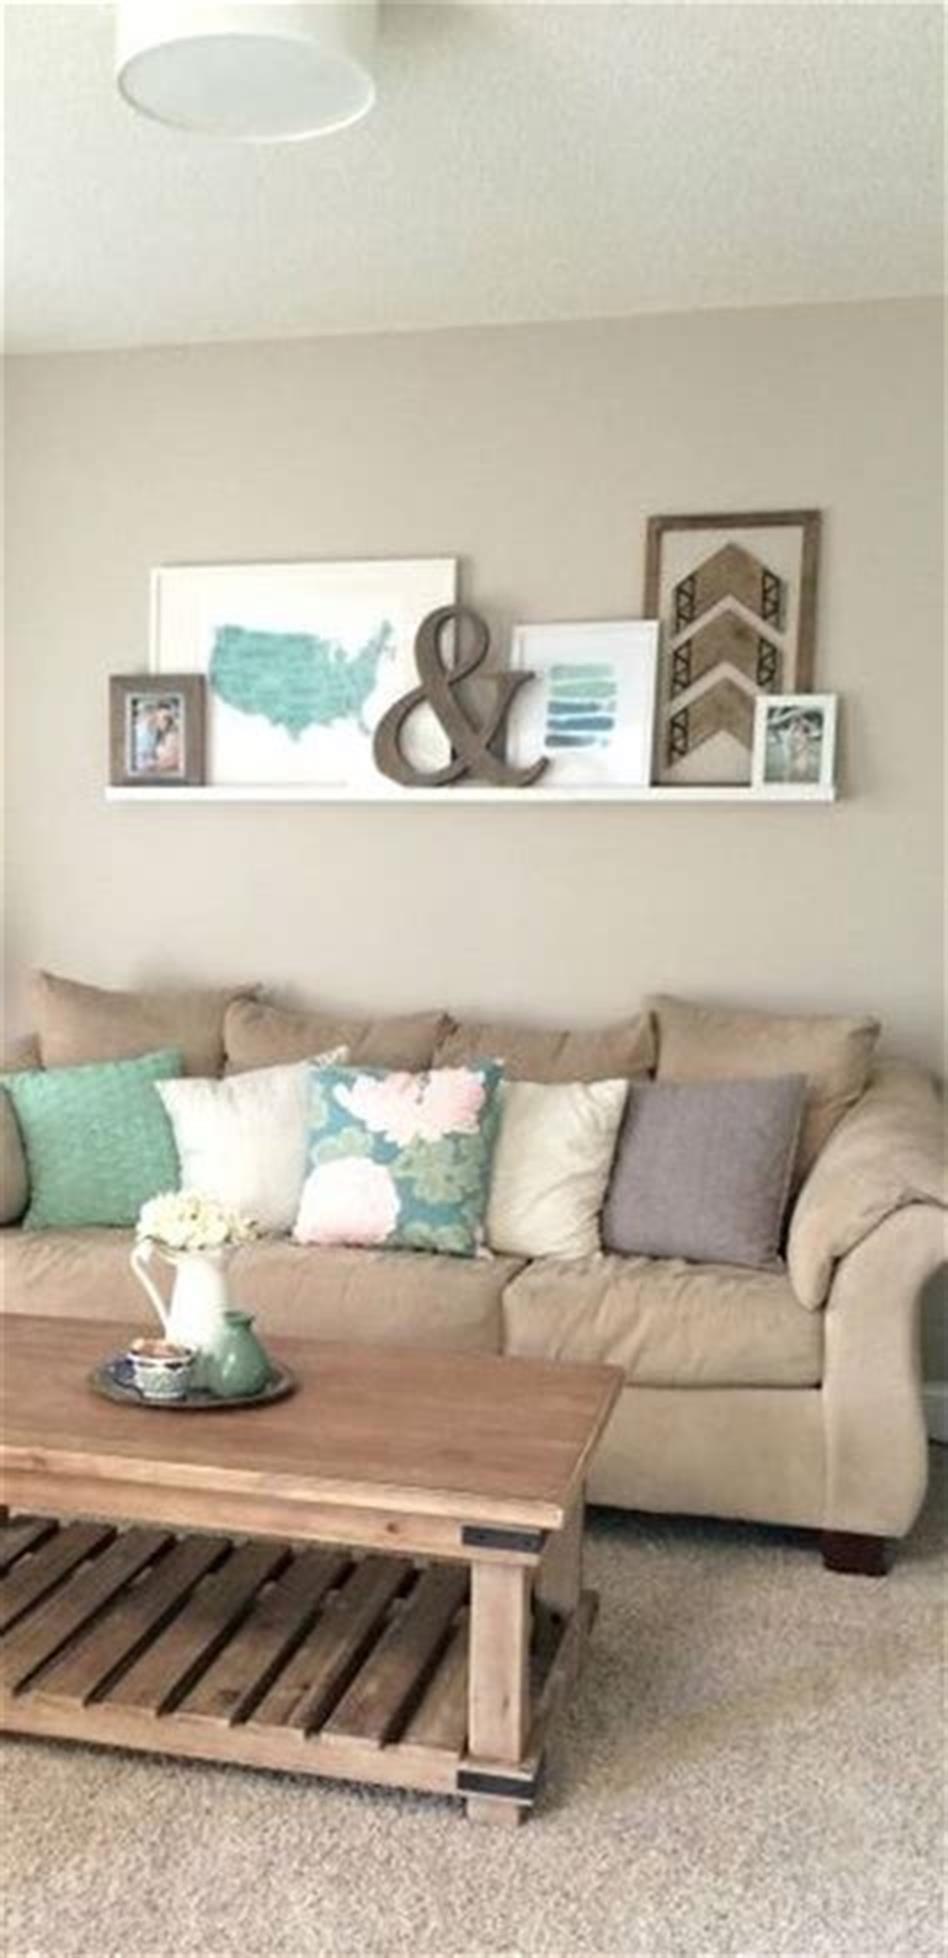 45 Simple Living Room Decorating Ideas On A Budget 2019 Comedecor Wall Decor Bedroom Wall Decor Living Room Apartment Living Room #simple #living #room #wall #decor #ideas